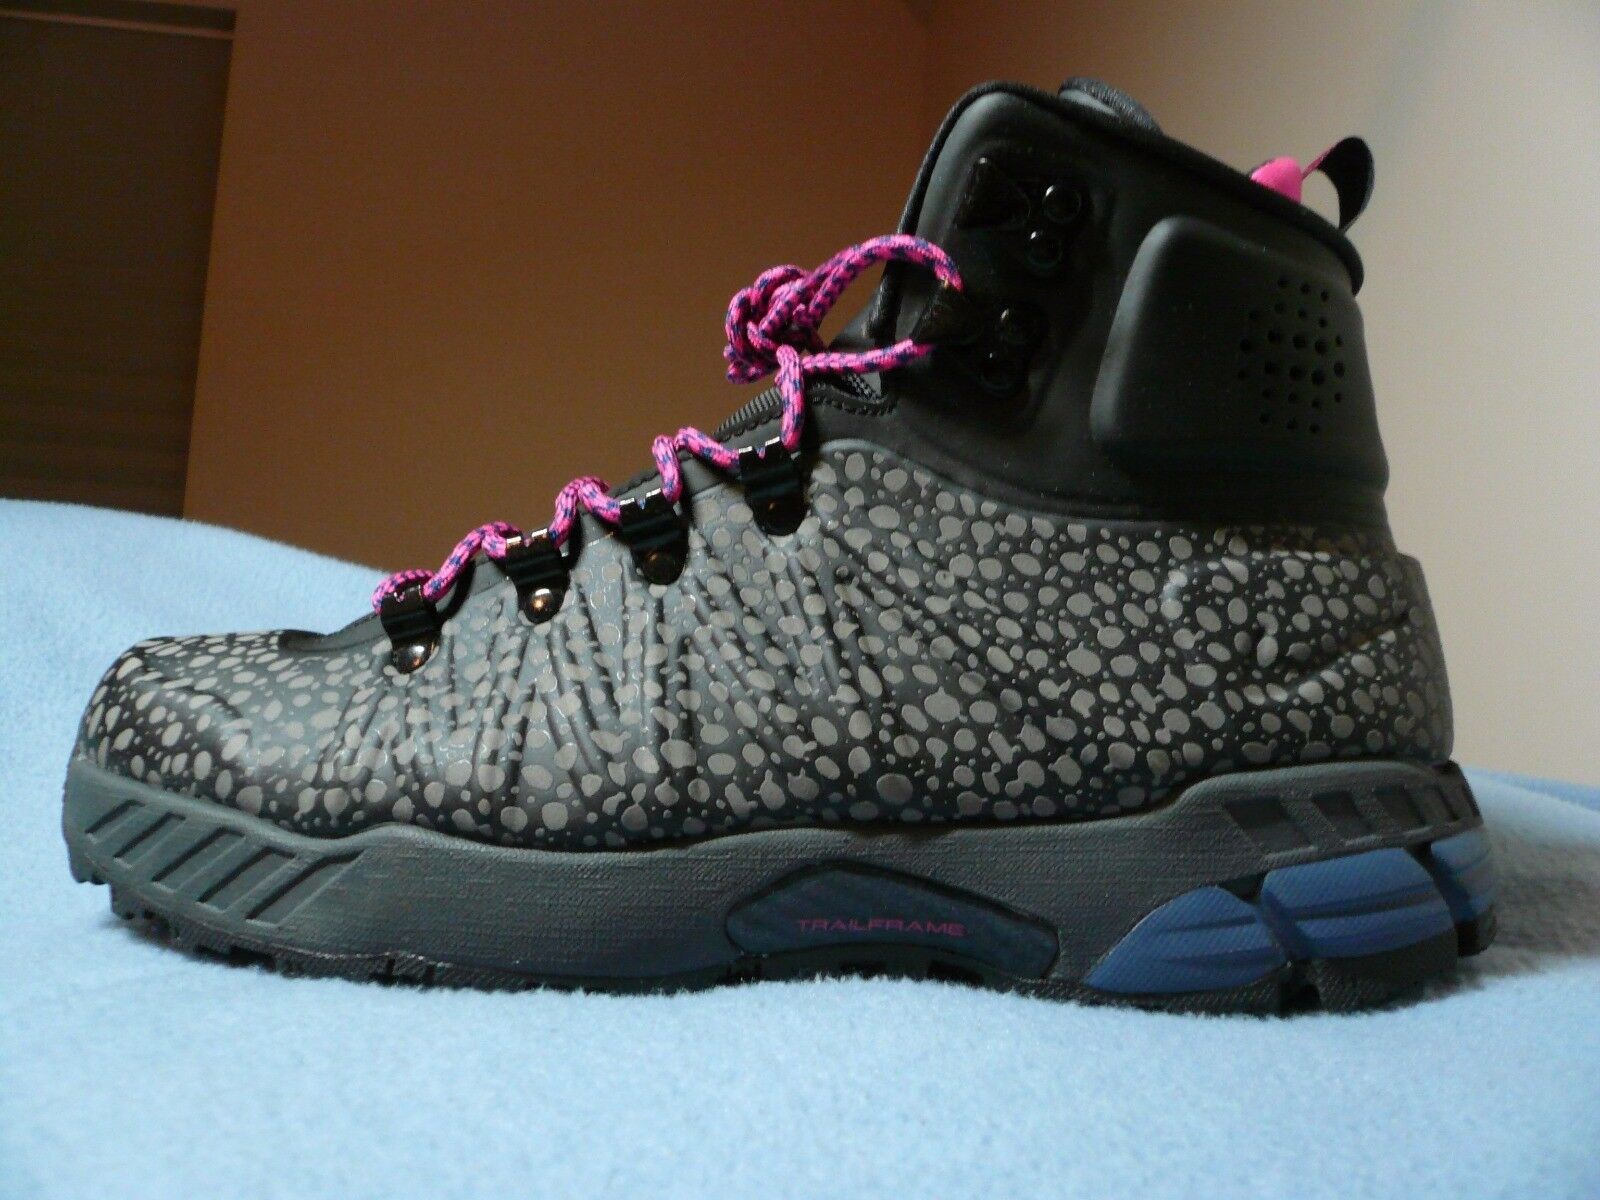 Nike zoom mw new posite dimensioni 8,5 brand new mw shoes 500a10